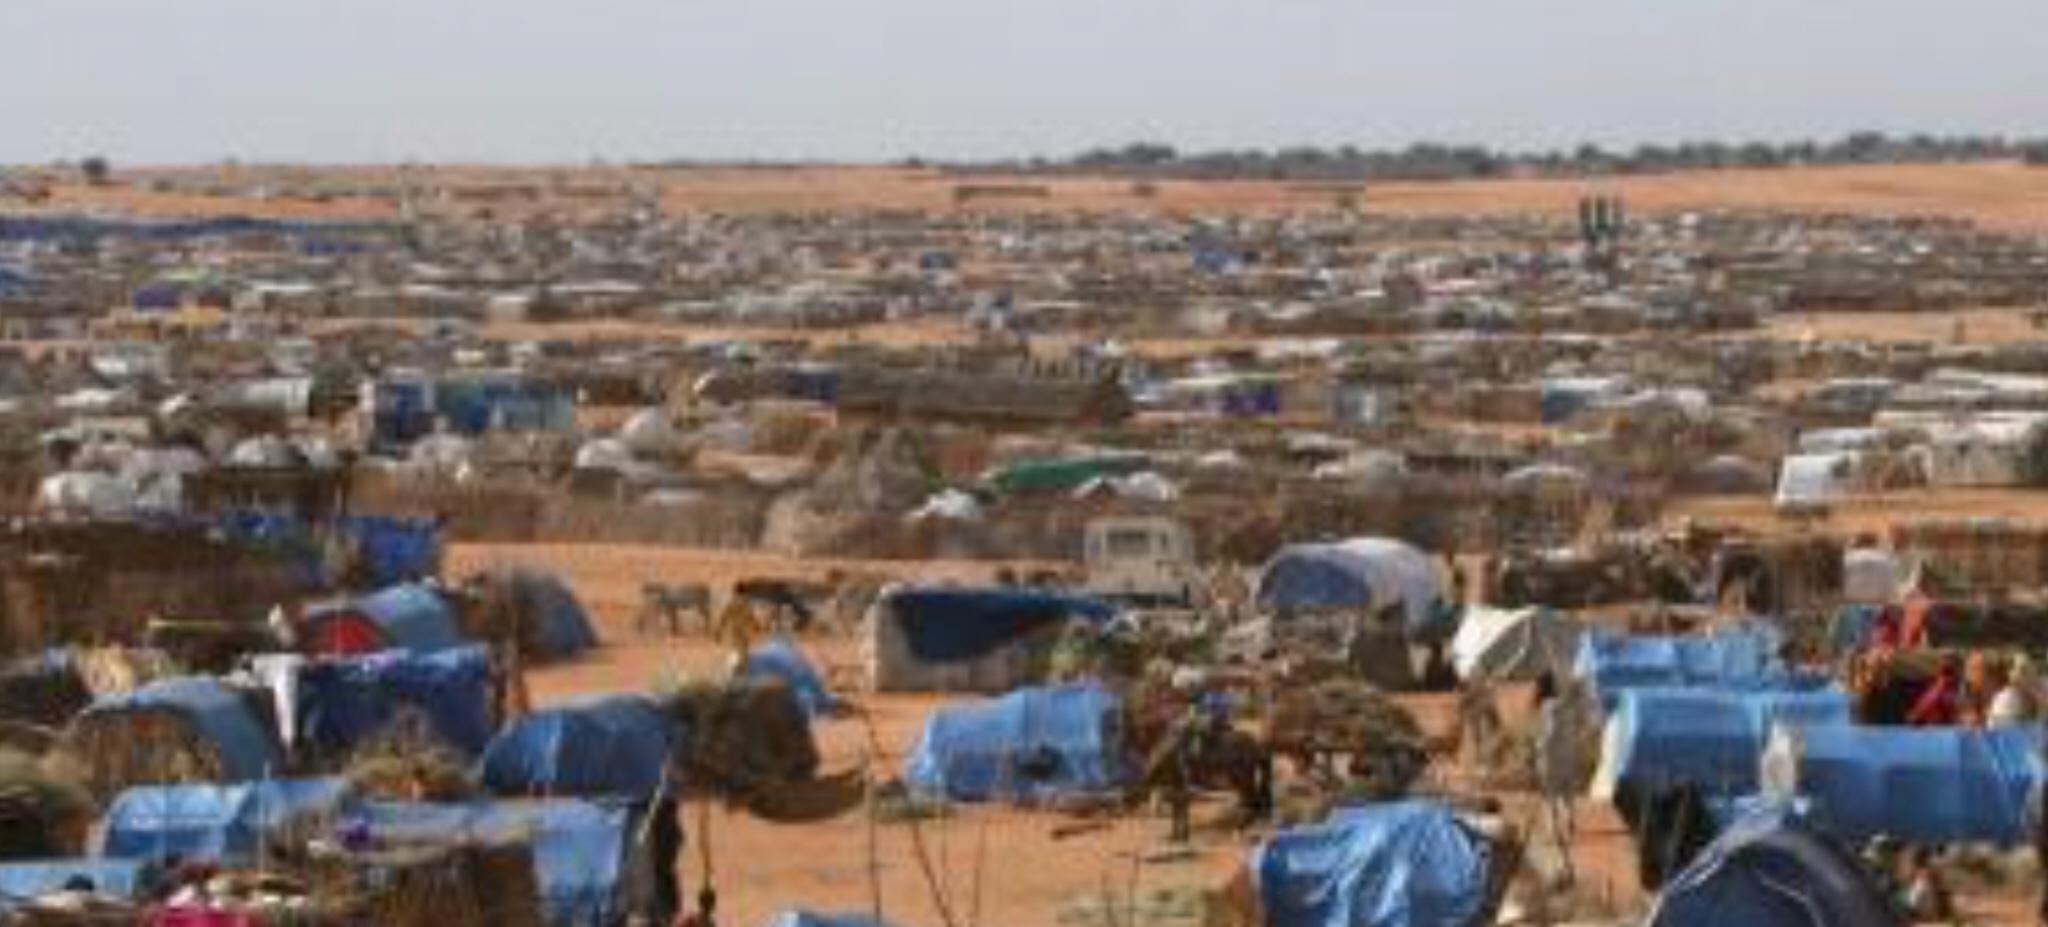 Borrell heads to Darfur